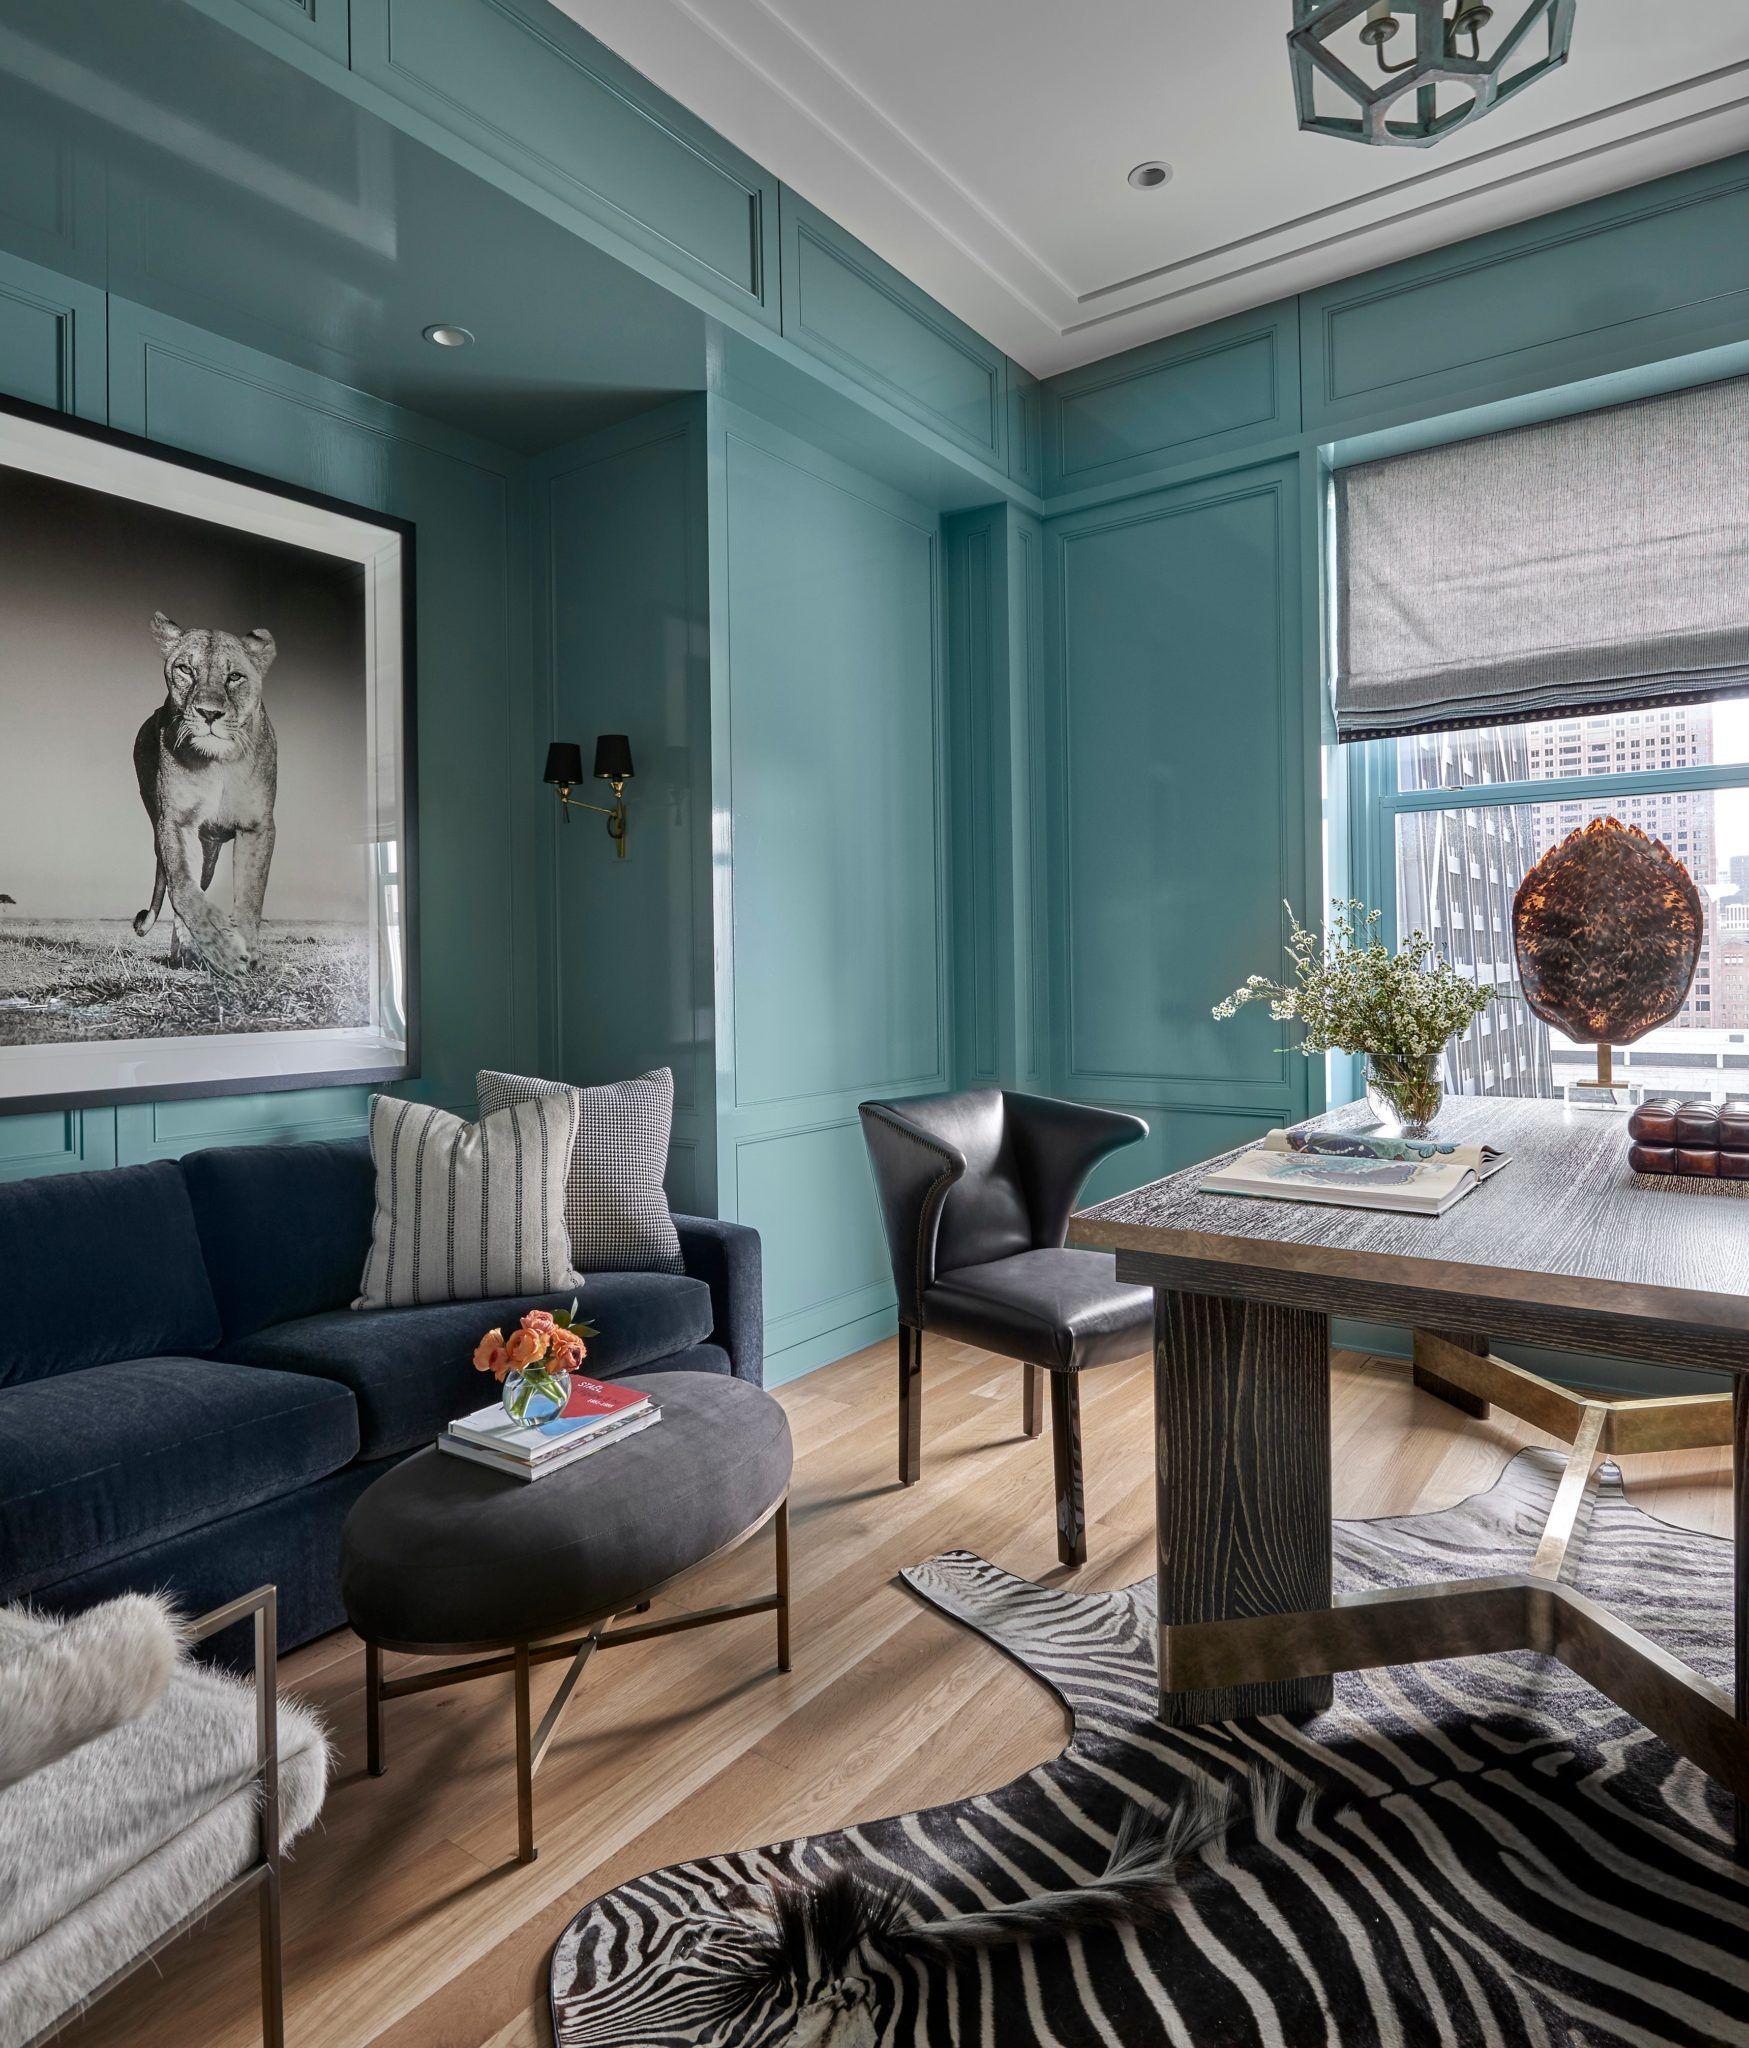 Get Inspired Visit Www Myhouseidea Com Myhouseidea Interiordesign Luxury Decor Facade House Minimalist House Design House Designs Exterior